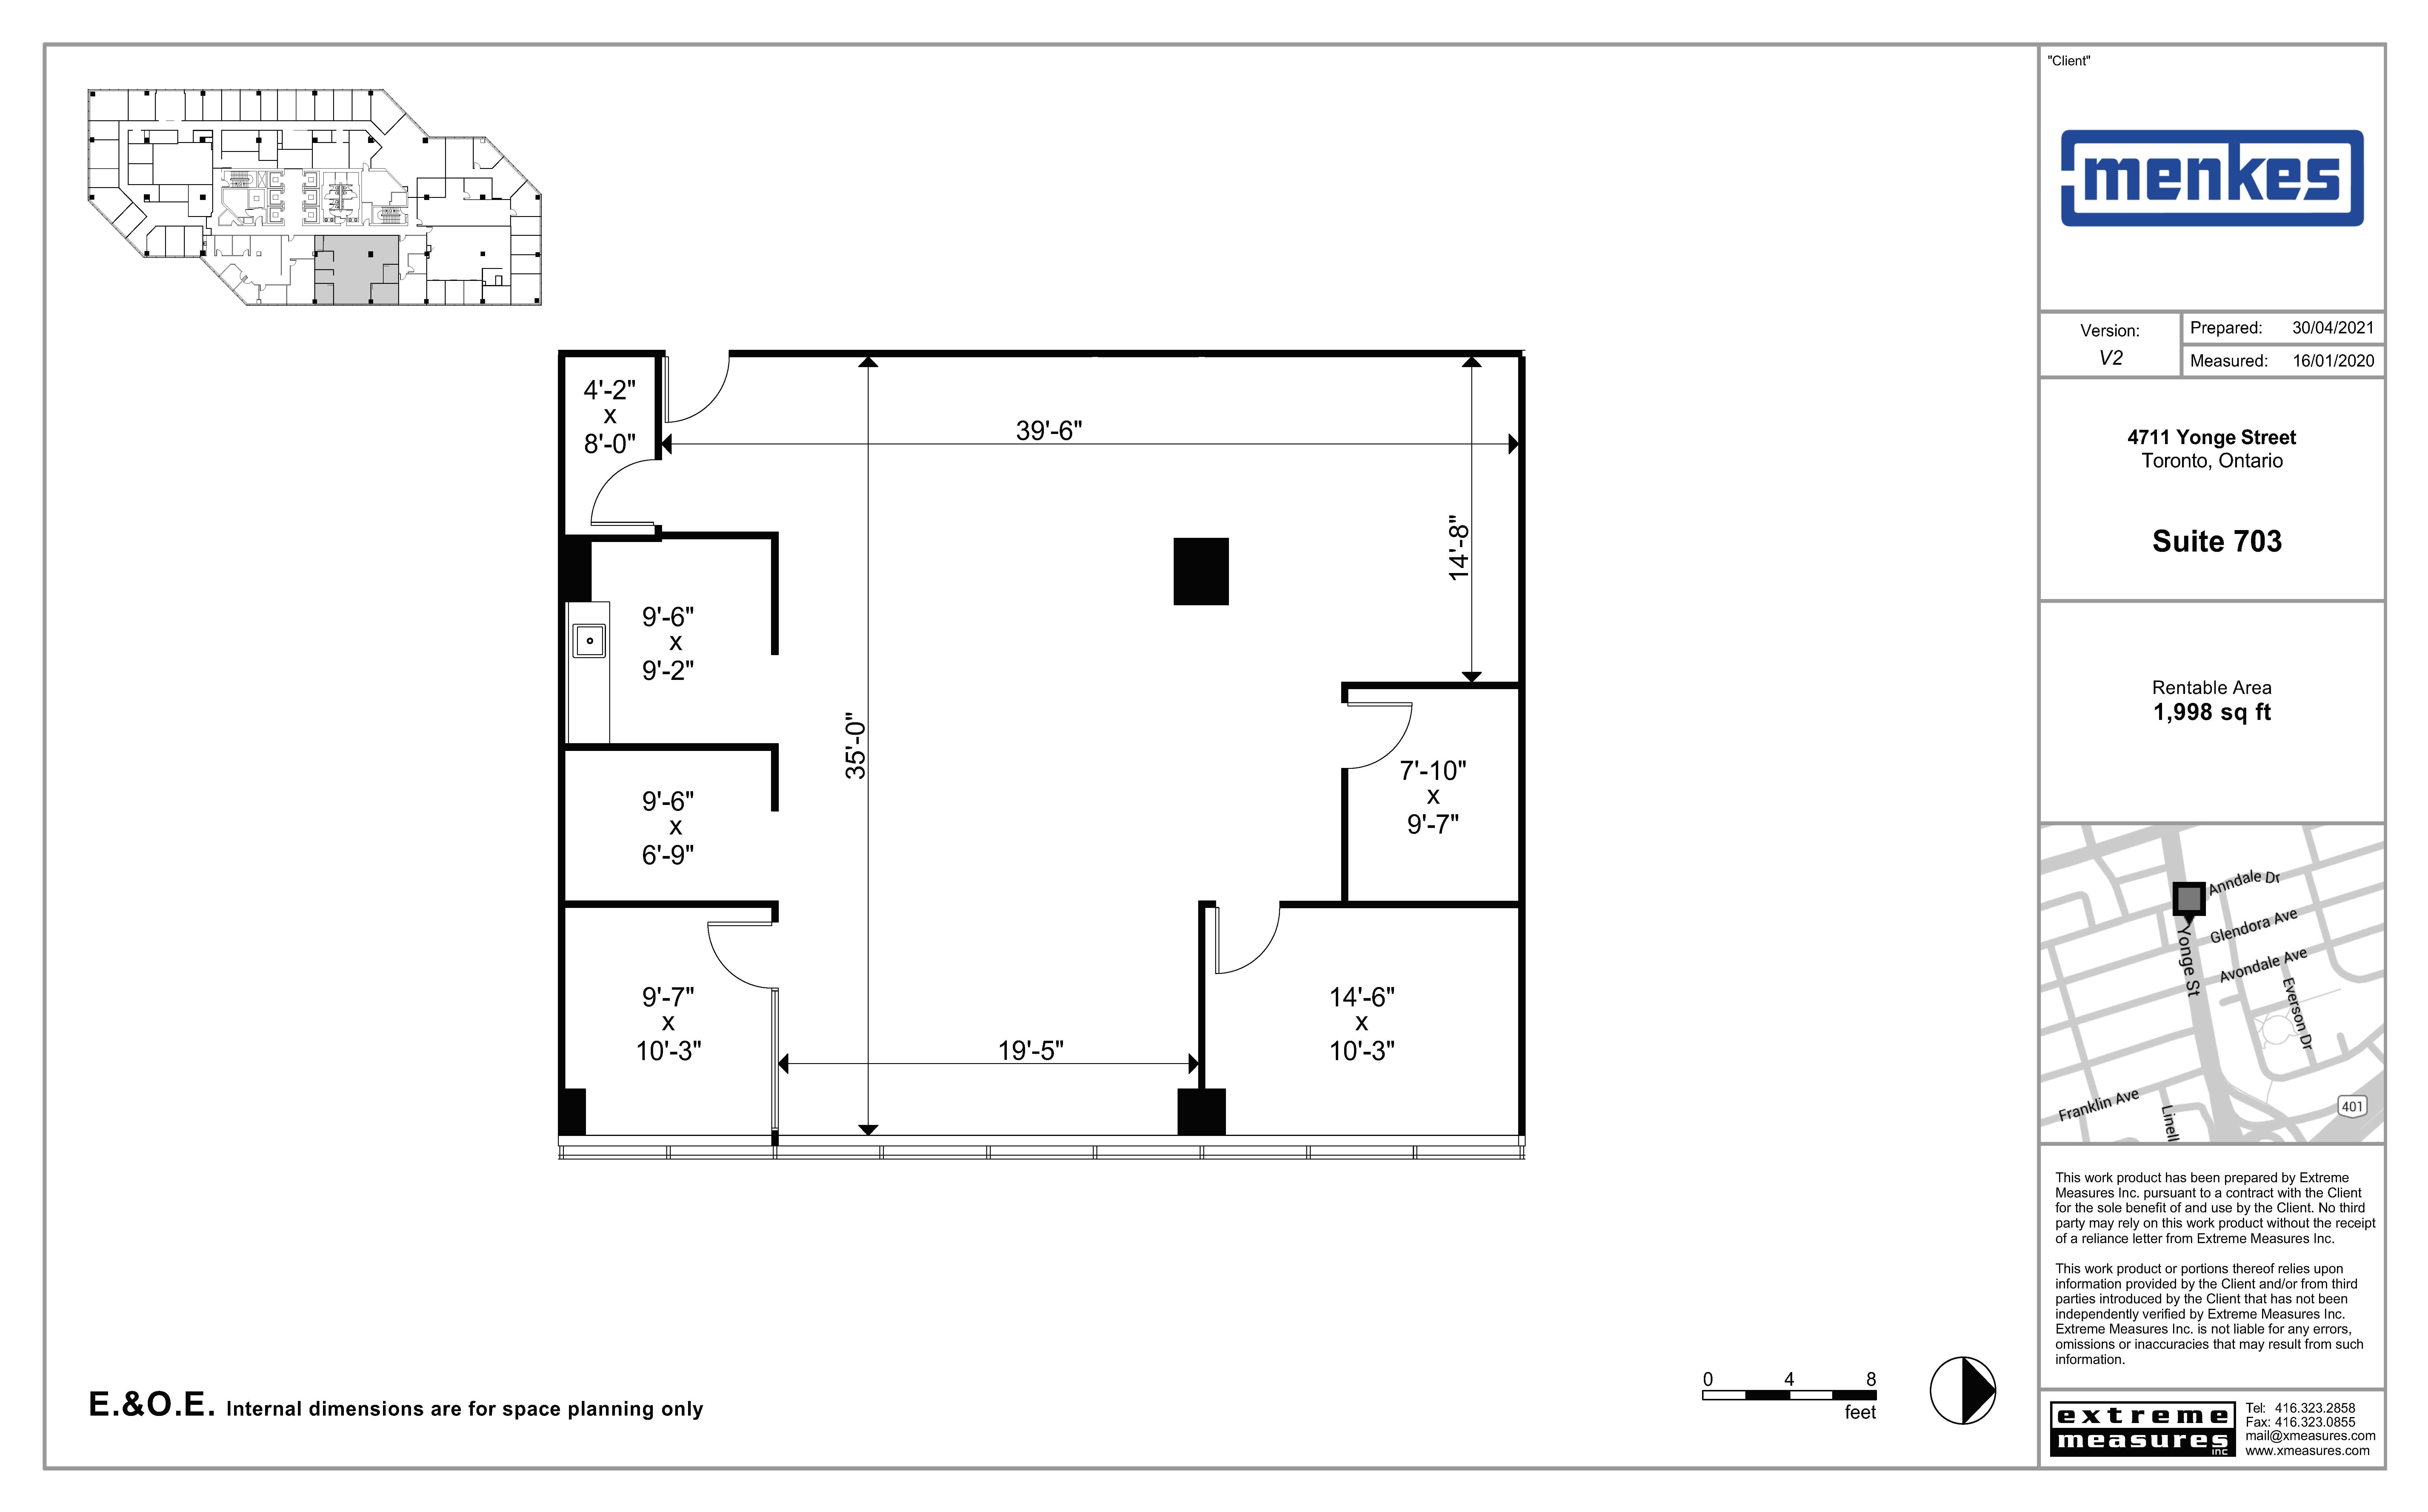 Floorplan thumbnail of Suite 703